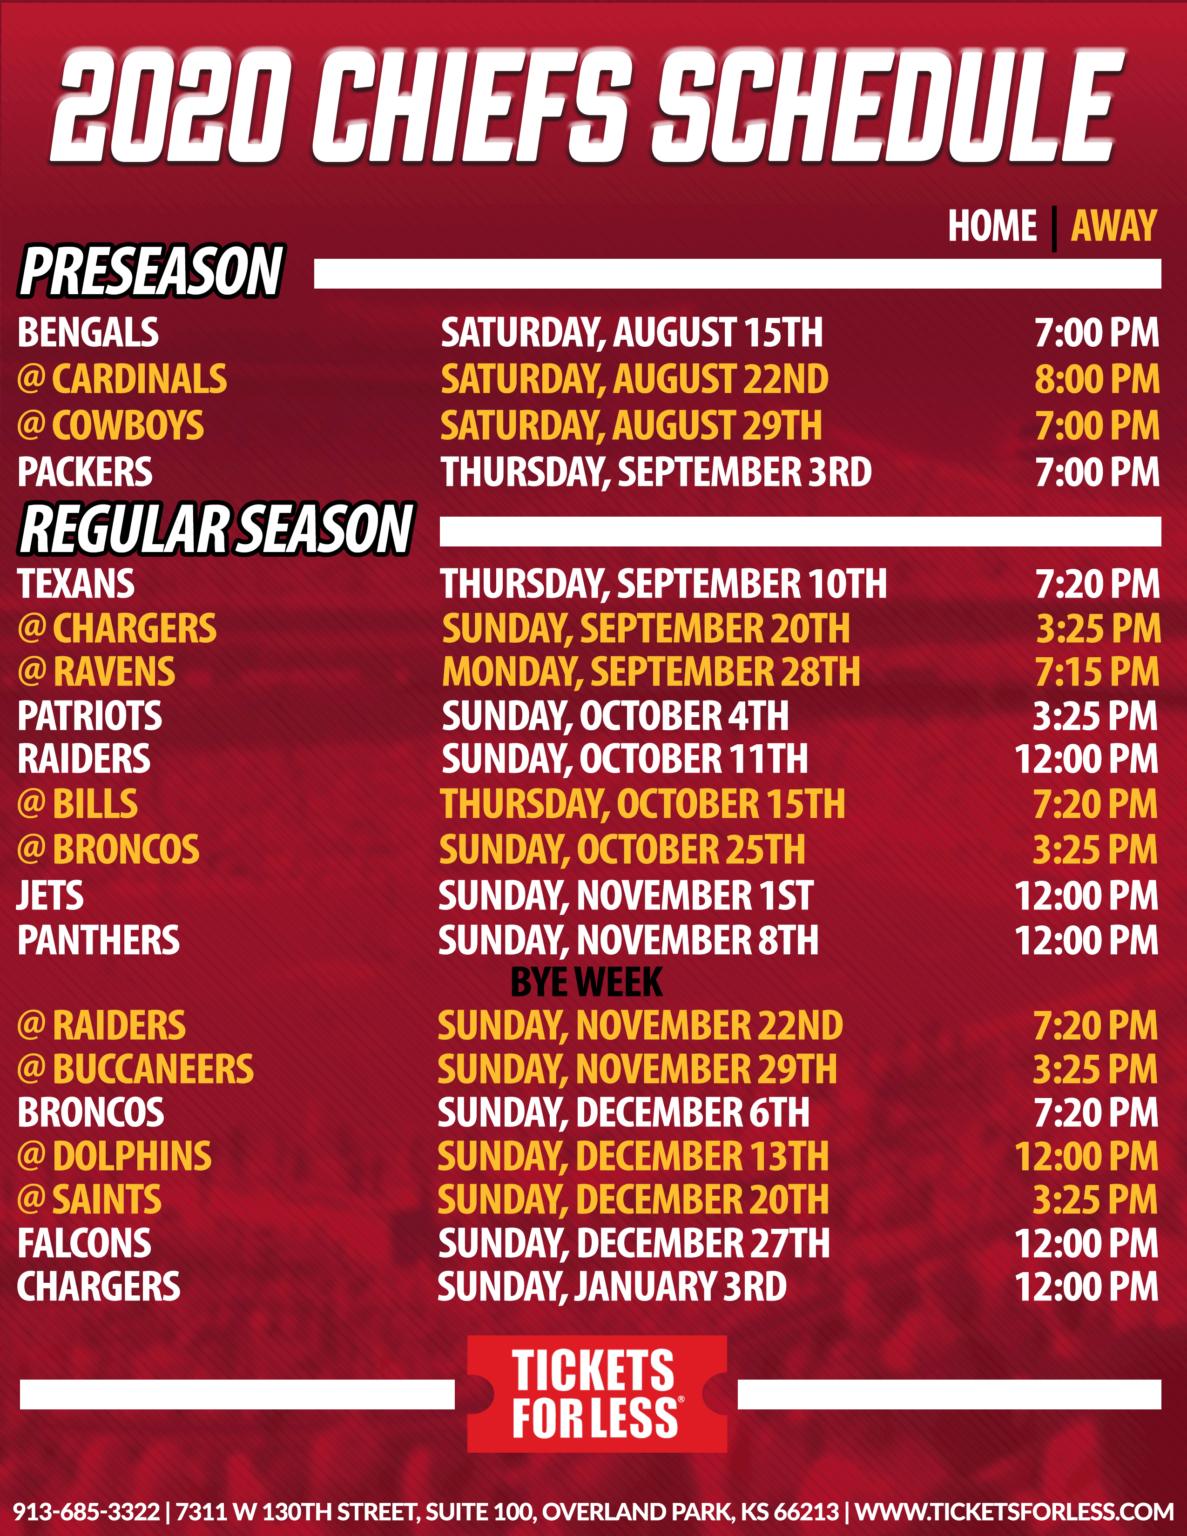 Chiefs Printable Schedule - Kansas City Chiefs Schedule in Nfl Printable Schedules 2021